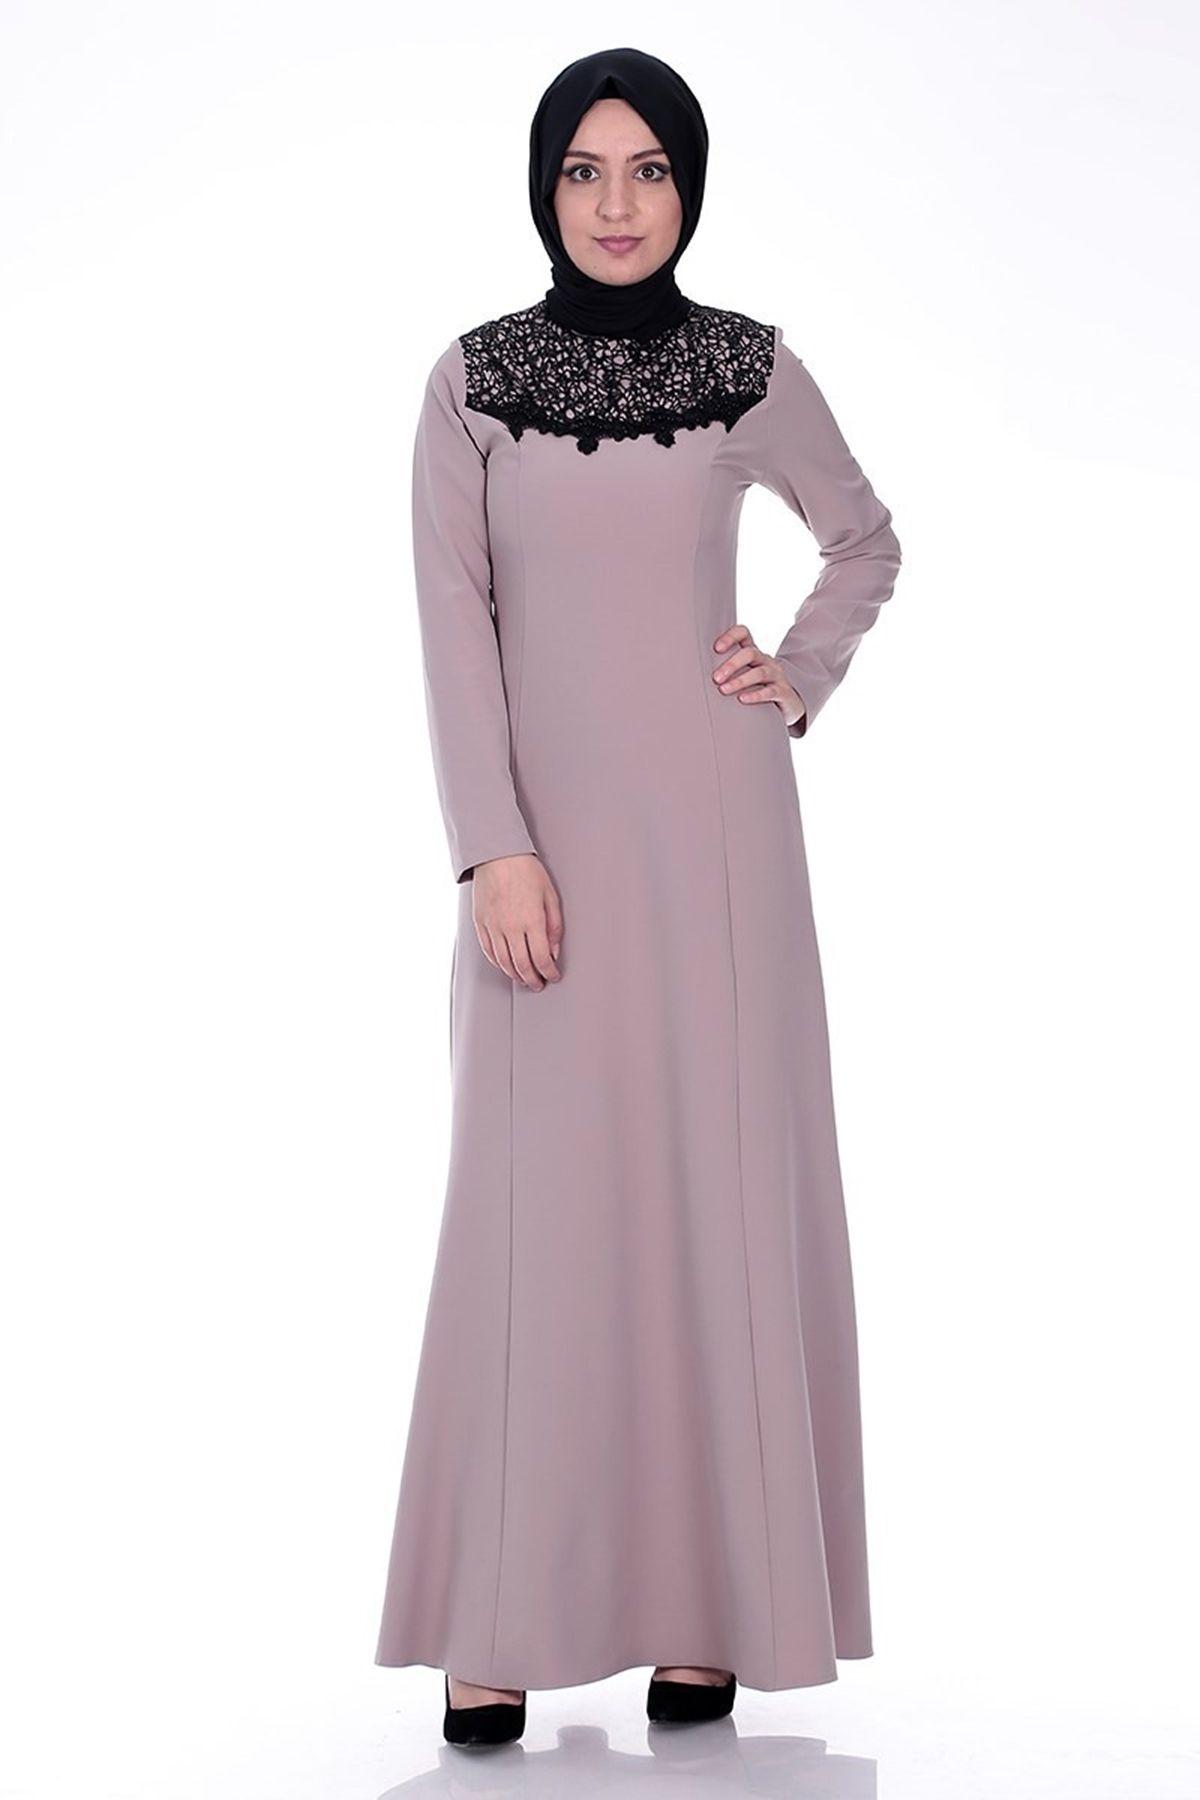 En Sik Patirti Com Tesettur Abiye Elbise Modelleri Https Www Tesetturelbisesi Com En Sik Patirti Com Tesettur Abiye Elbise High Neck Dress Dresses Fashion